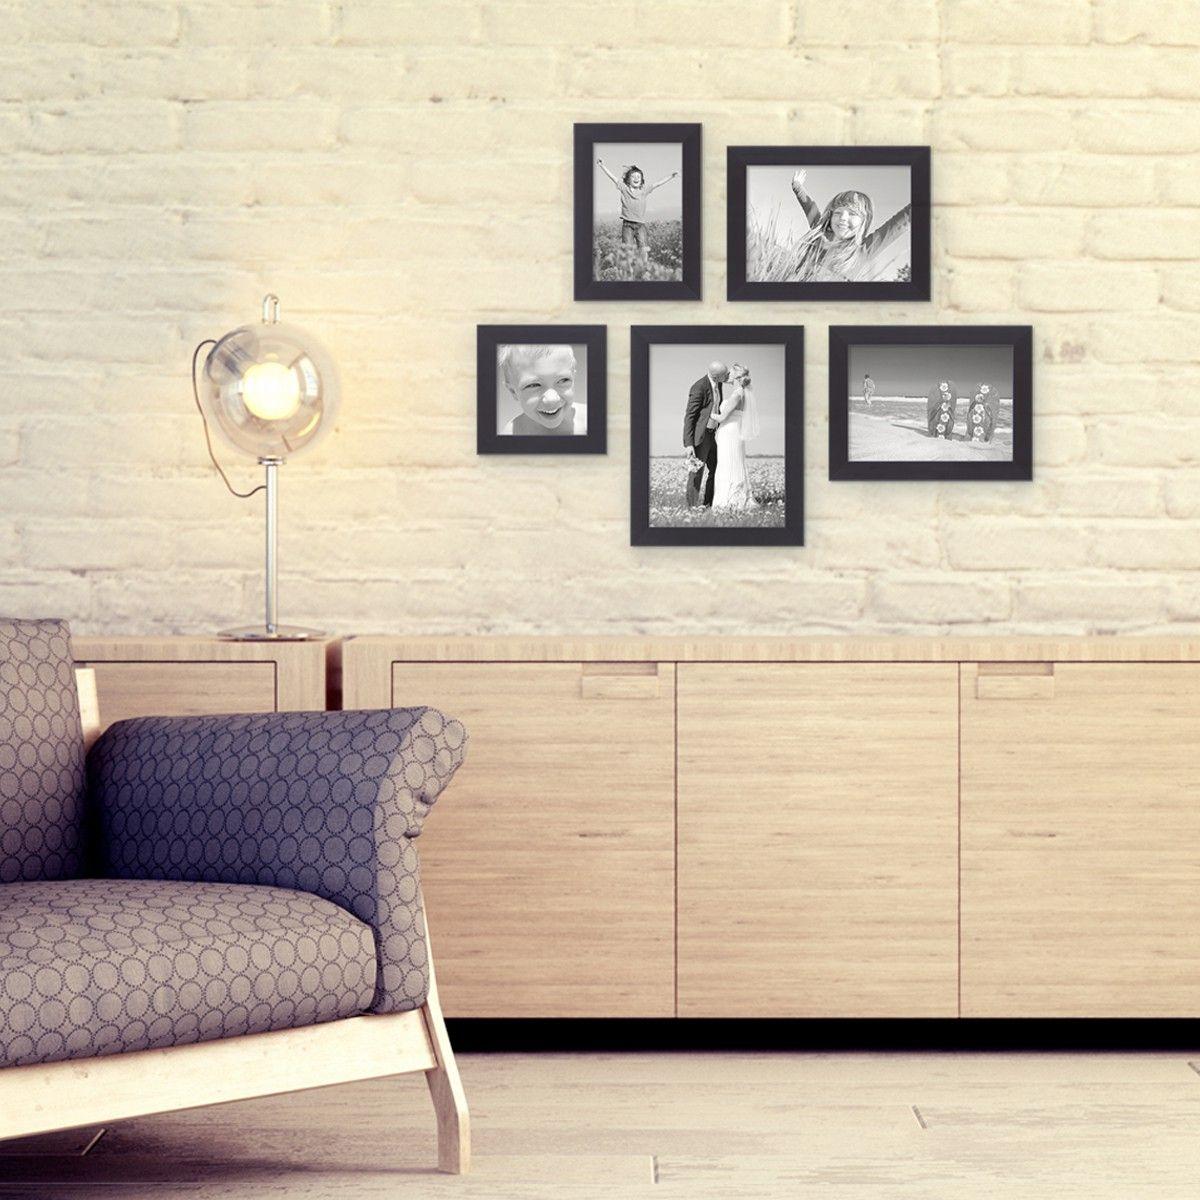 5er bilderrahmen set cm schwarz modern massivholz bilderw nde gestalten pinterest. Black Bedroom Furniture Sets. Home Design Ideas